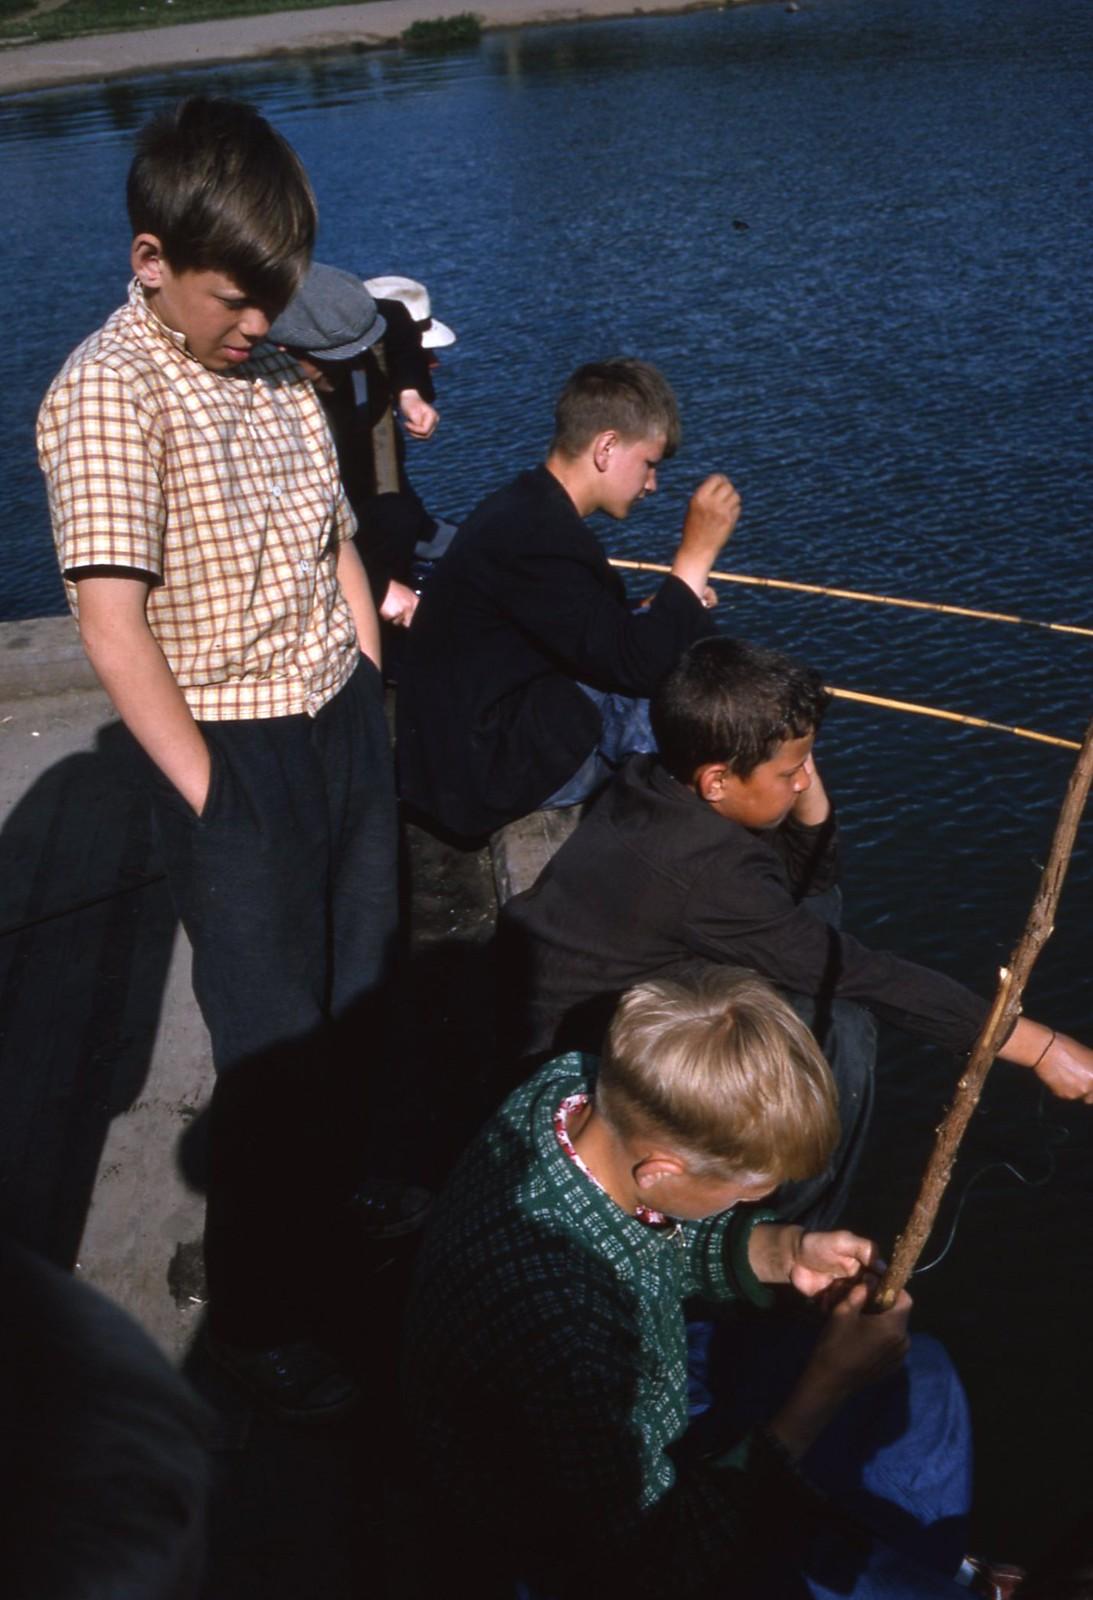 hammond-MA10-Ostankino-people-sunbathing-and-fishing-006